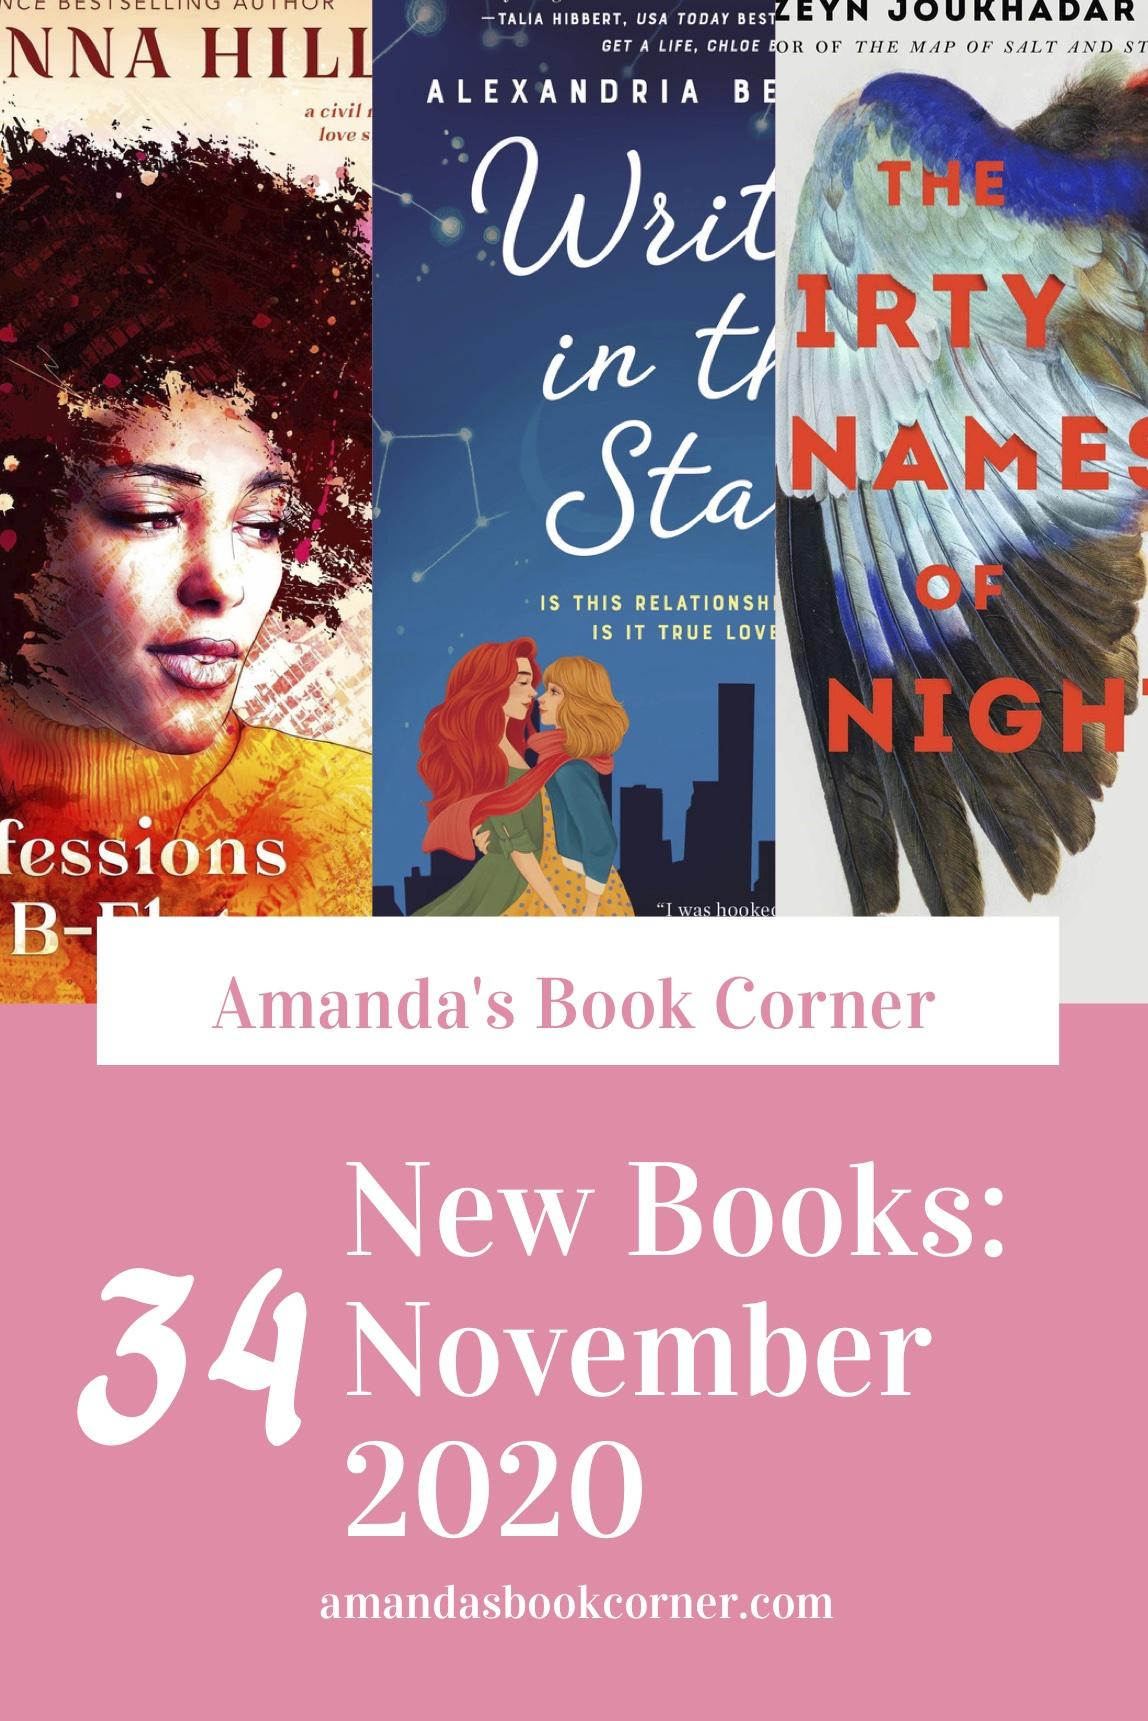 New Books - November 2020